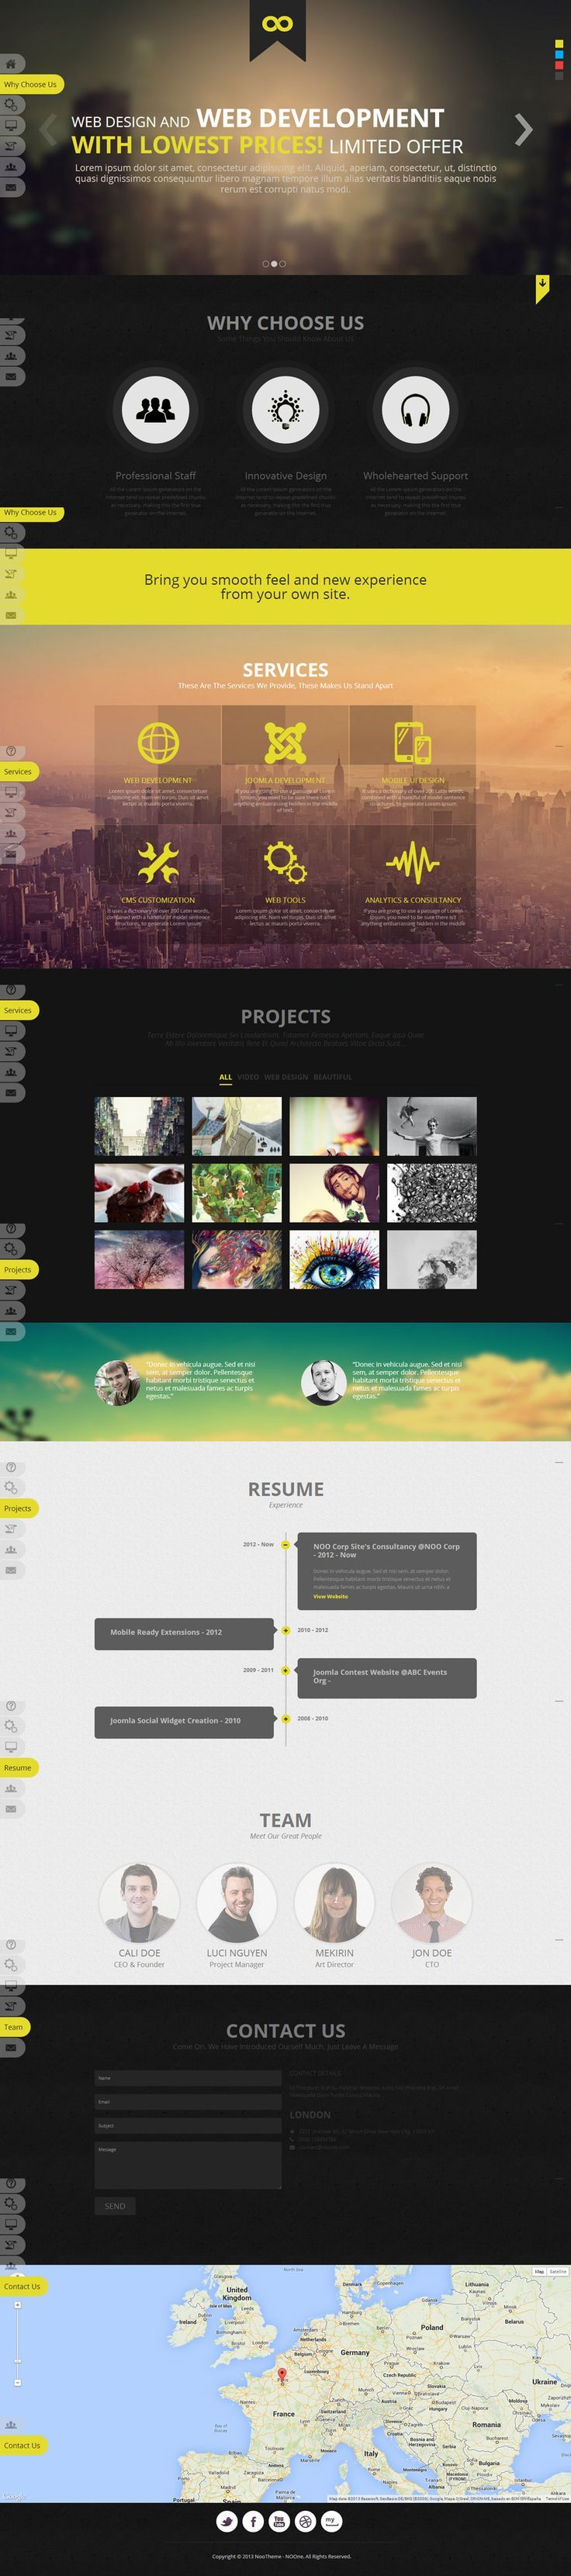 69 best Joomla I love images on Pinterest